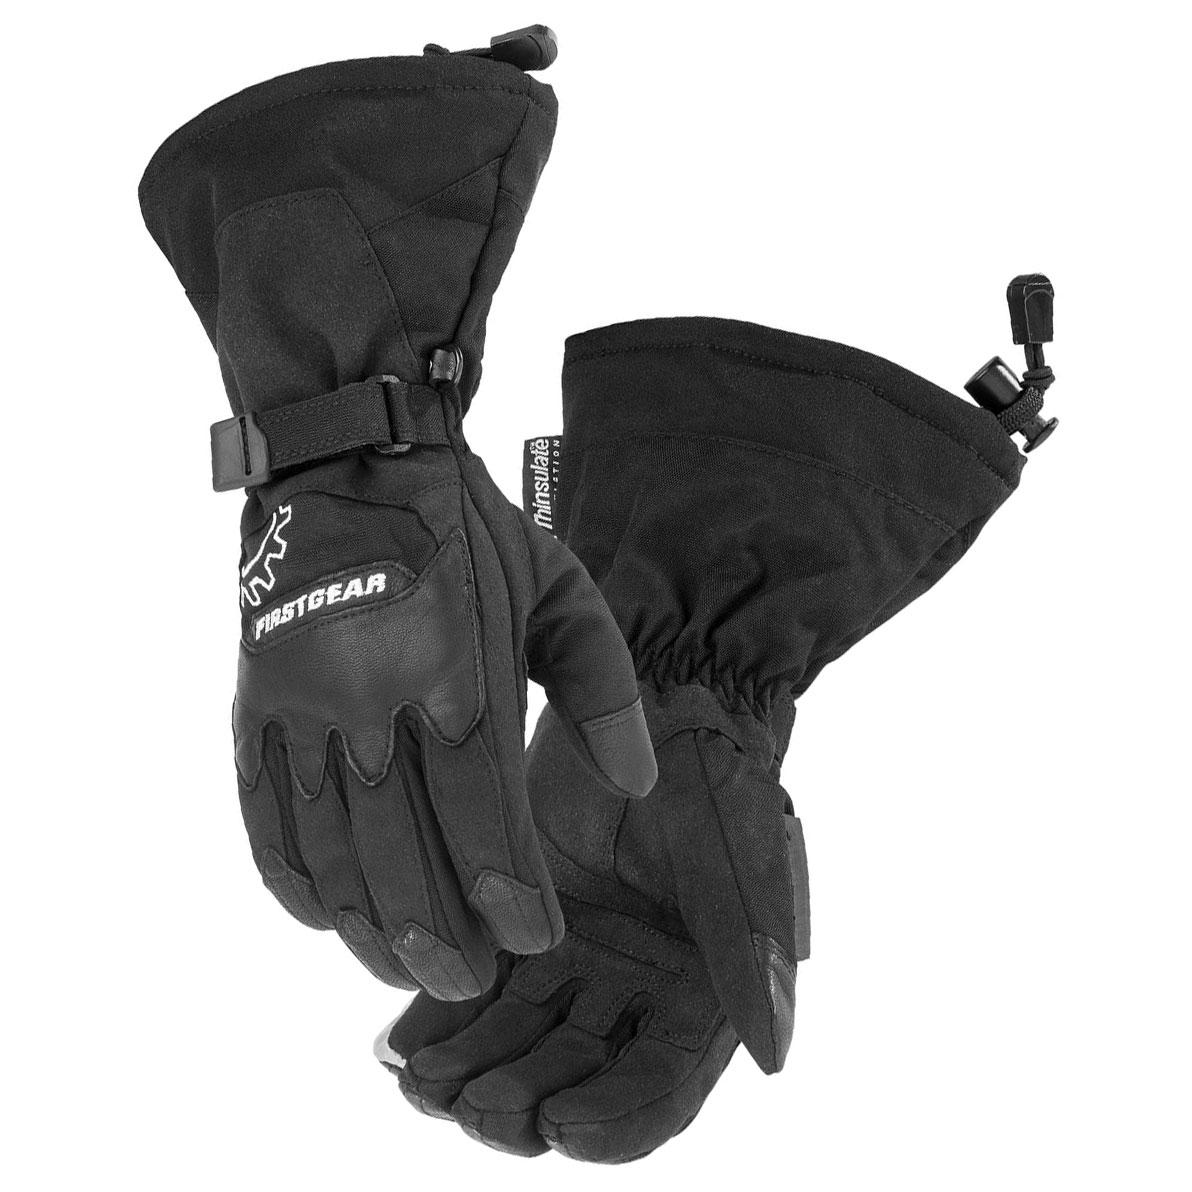 Firstgear Women's Exlporer Black Gloves